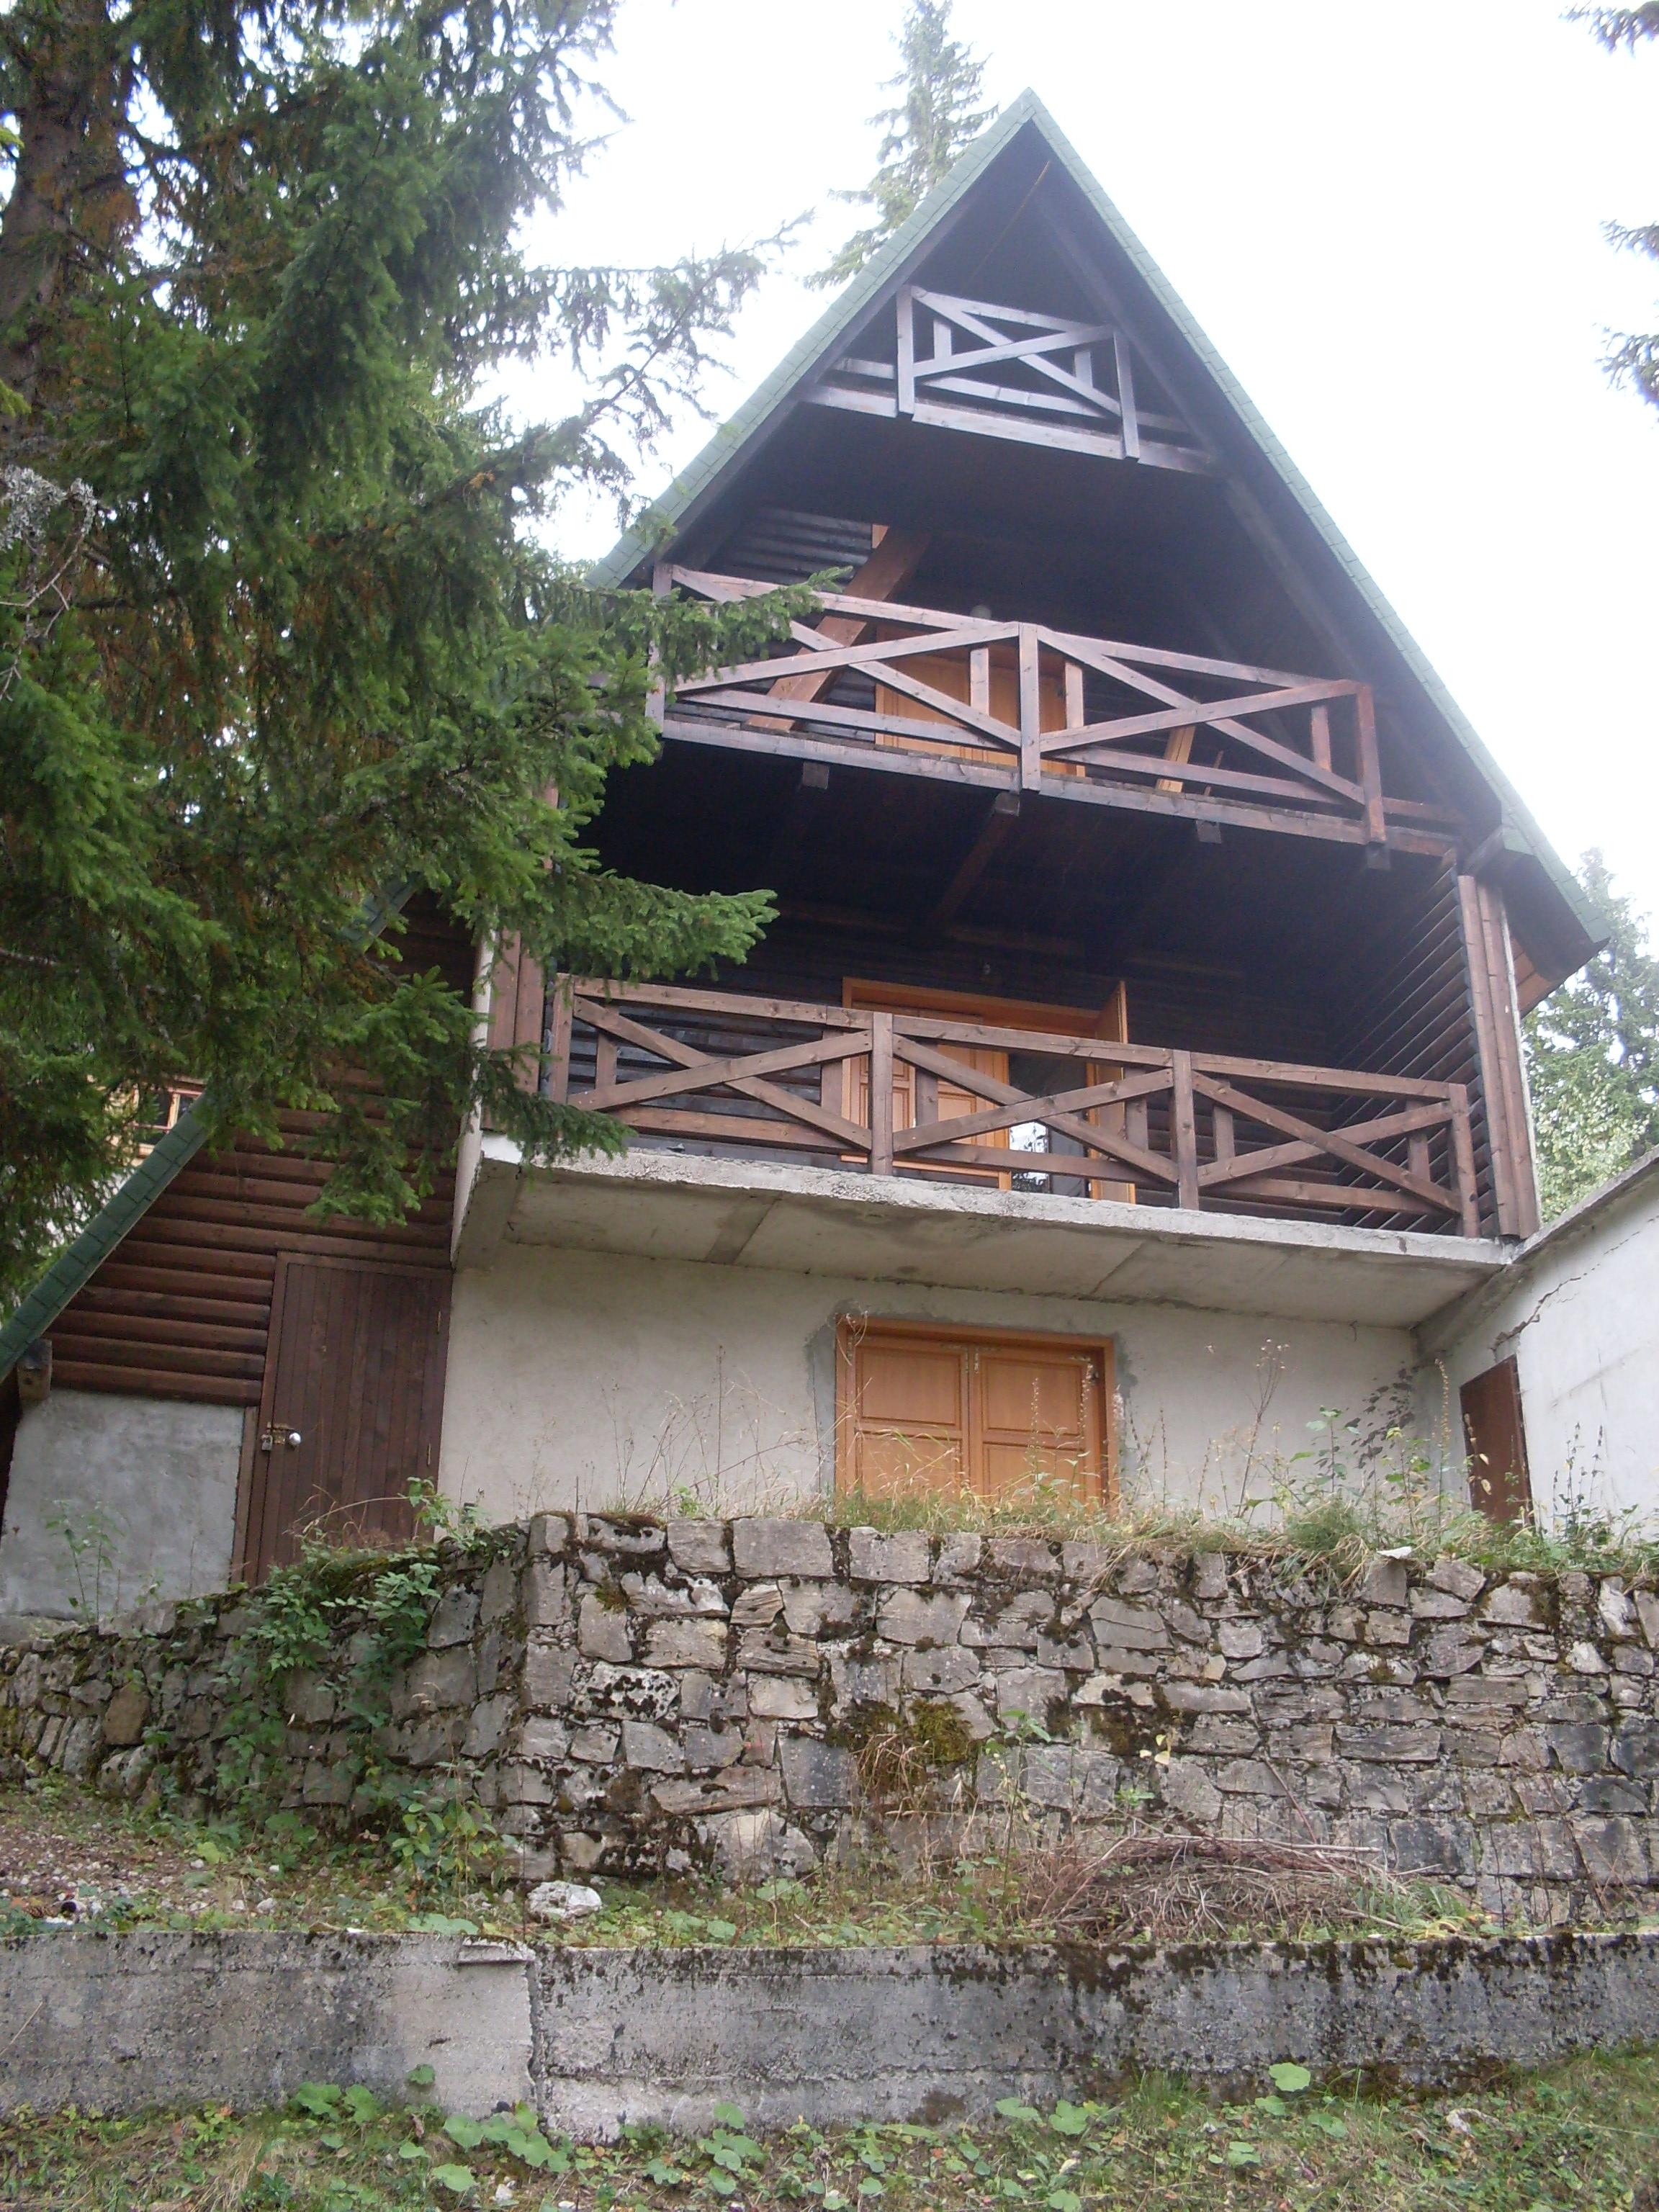 Verkoop huis vlasic travnik bosnie herzegovina vlasic for Huis verkoop site